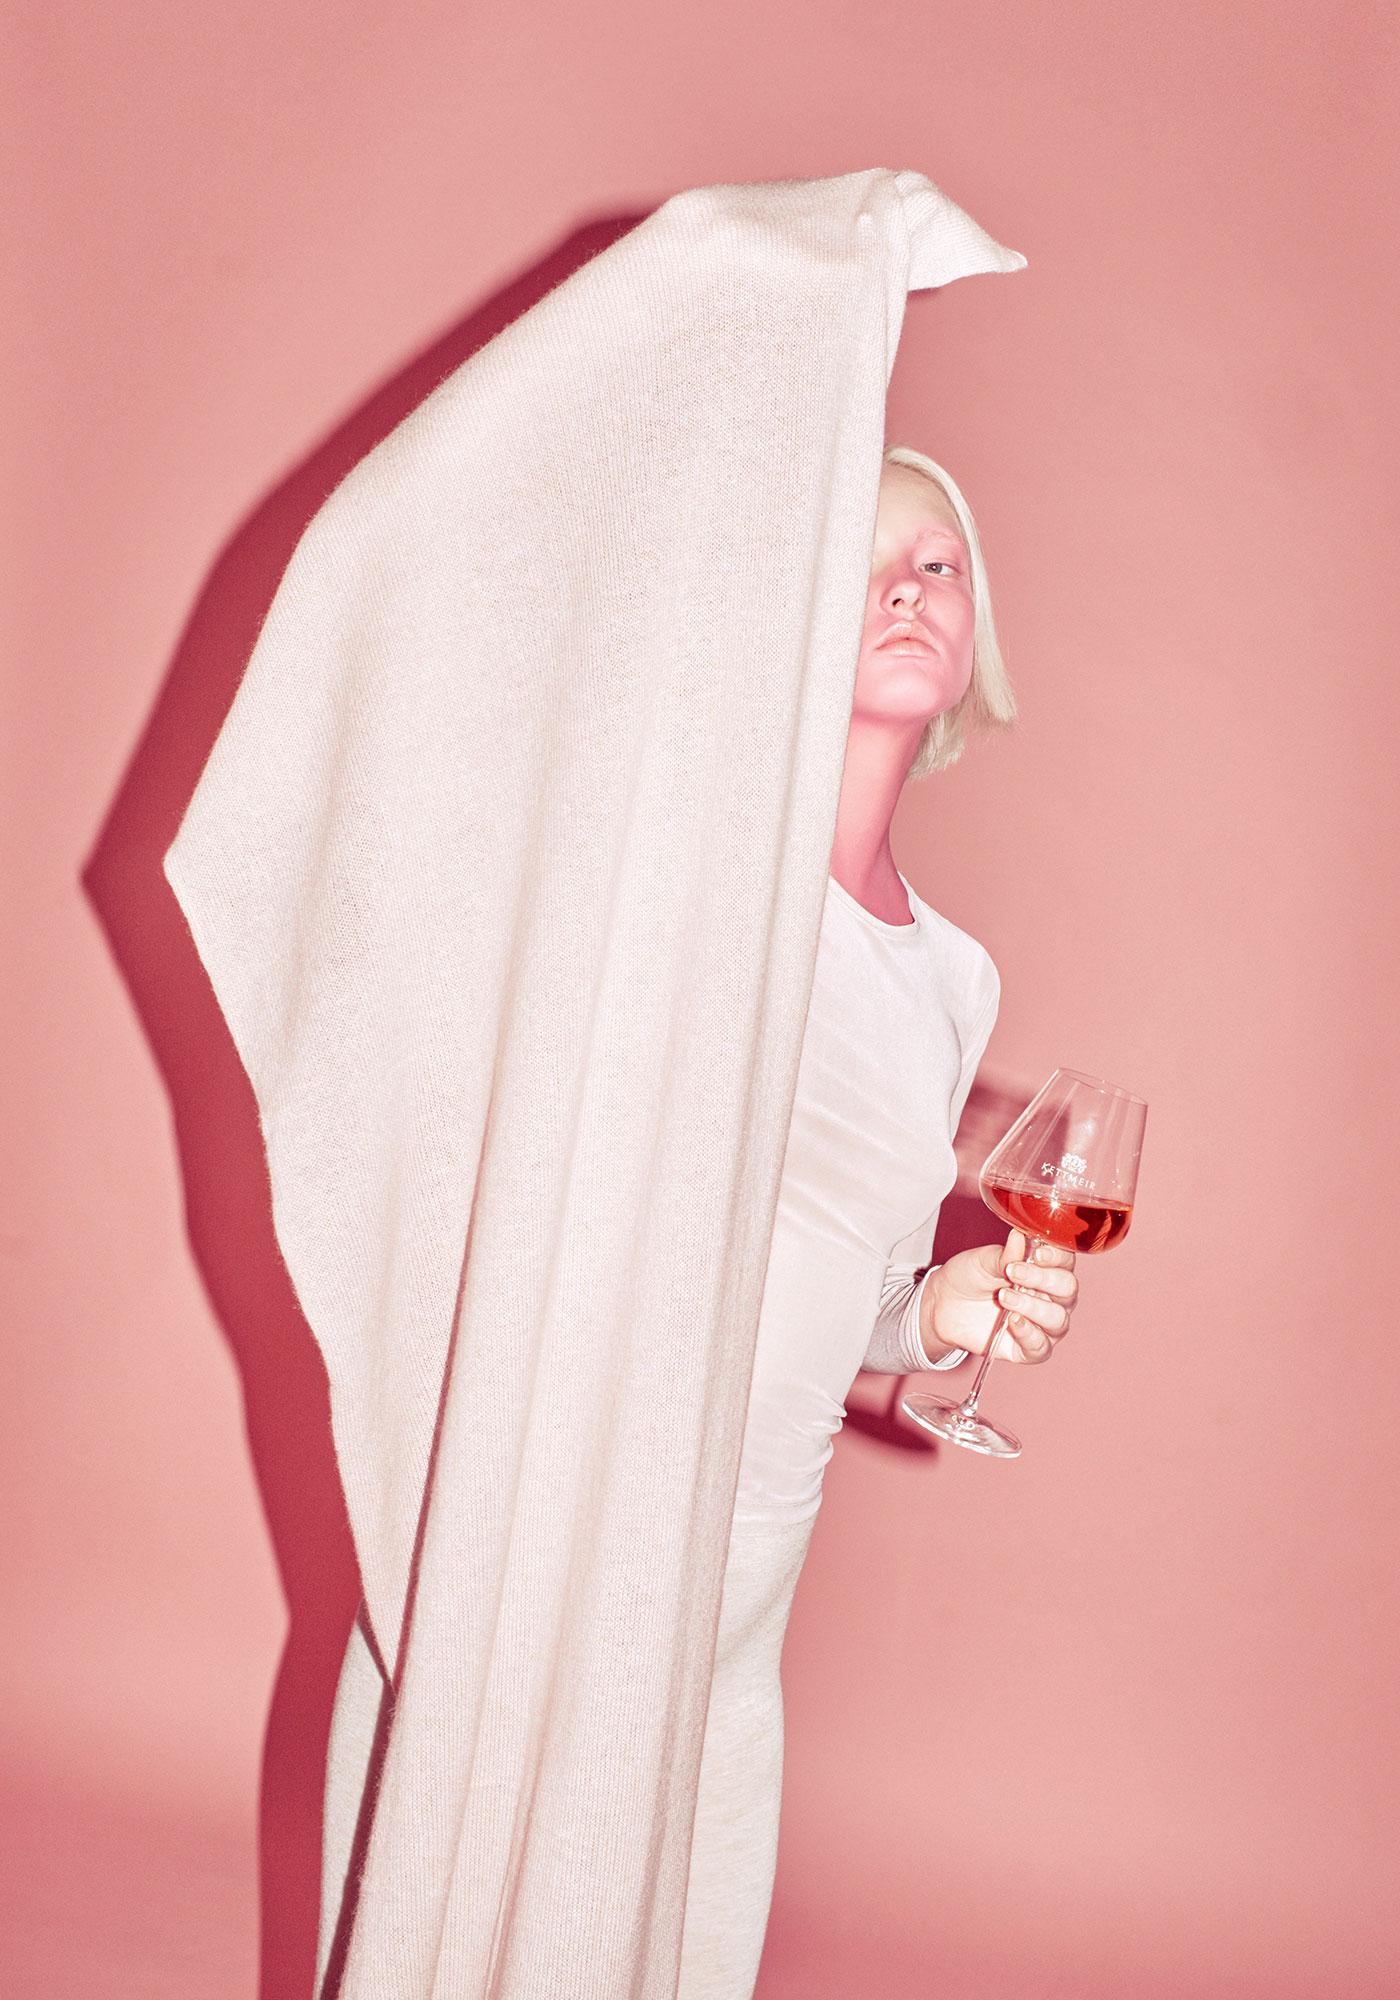 Kettmeir Wines Special Project 2019 | Marco Pietracupa | Numerique Retouch Photo Retouching Studio